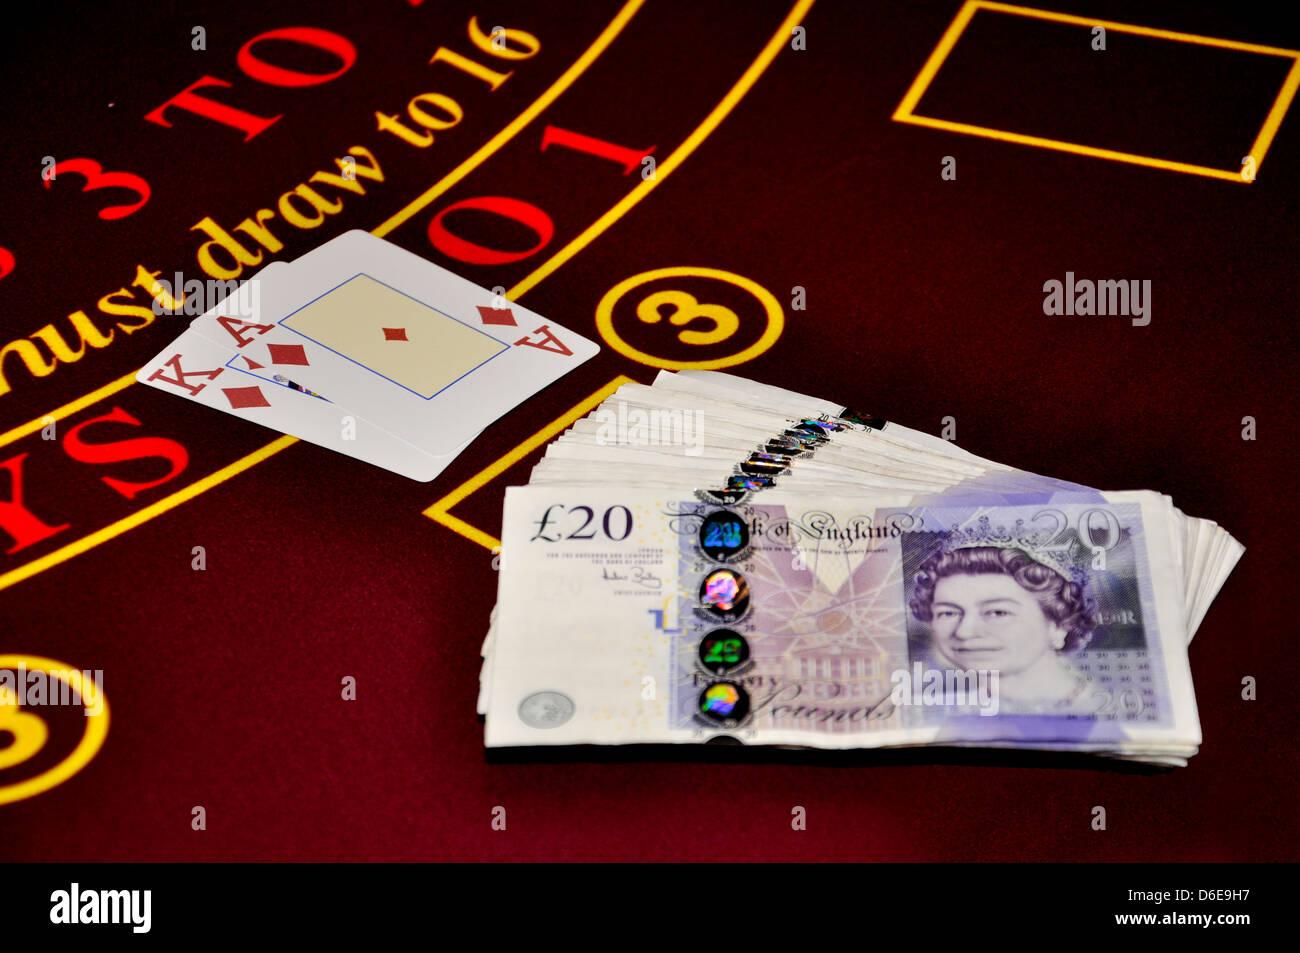 blackjack black jack ace king diamonds red twenty pound notes bundle winner casino game table money - Stock Image